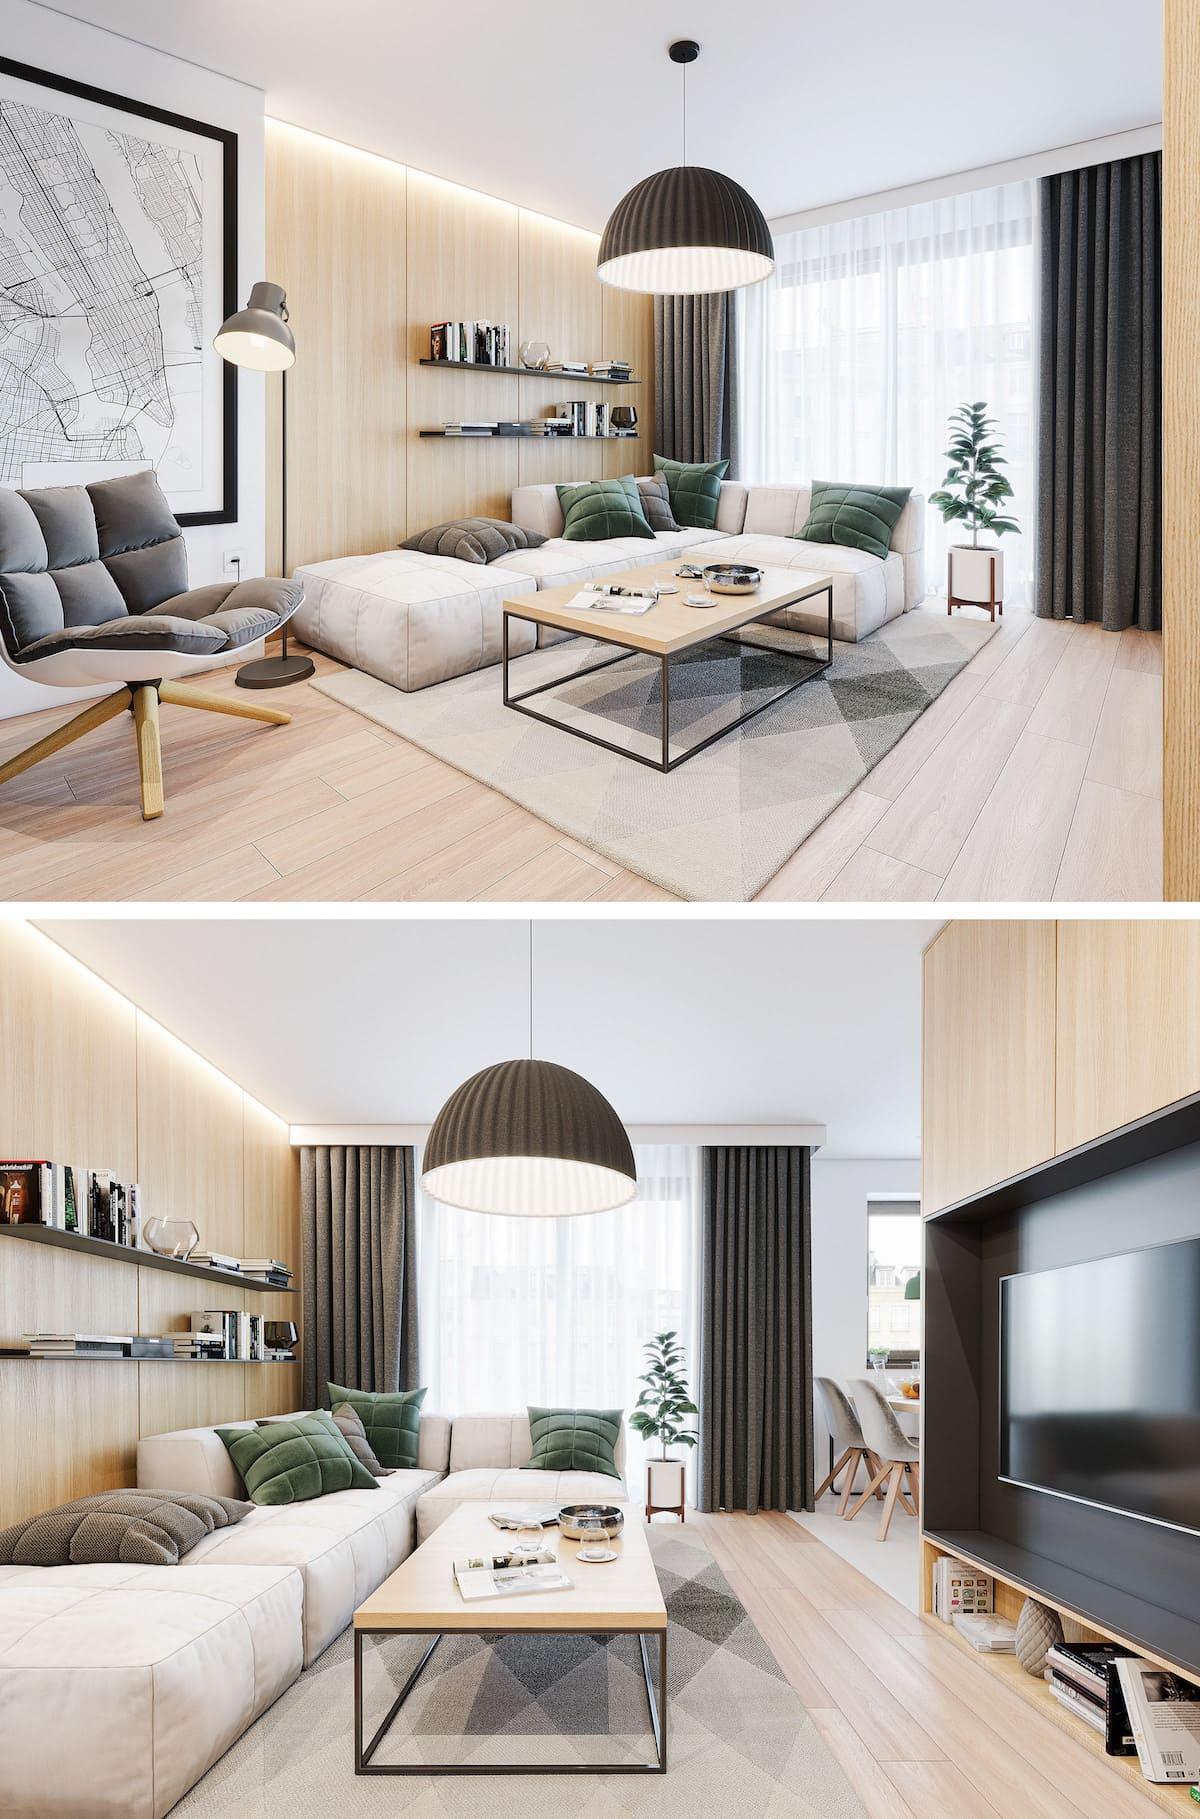 дизайн однокомнатной квартиры фото 72